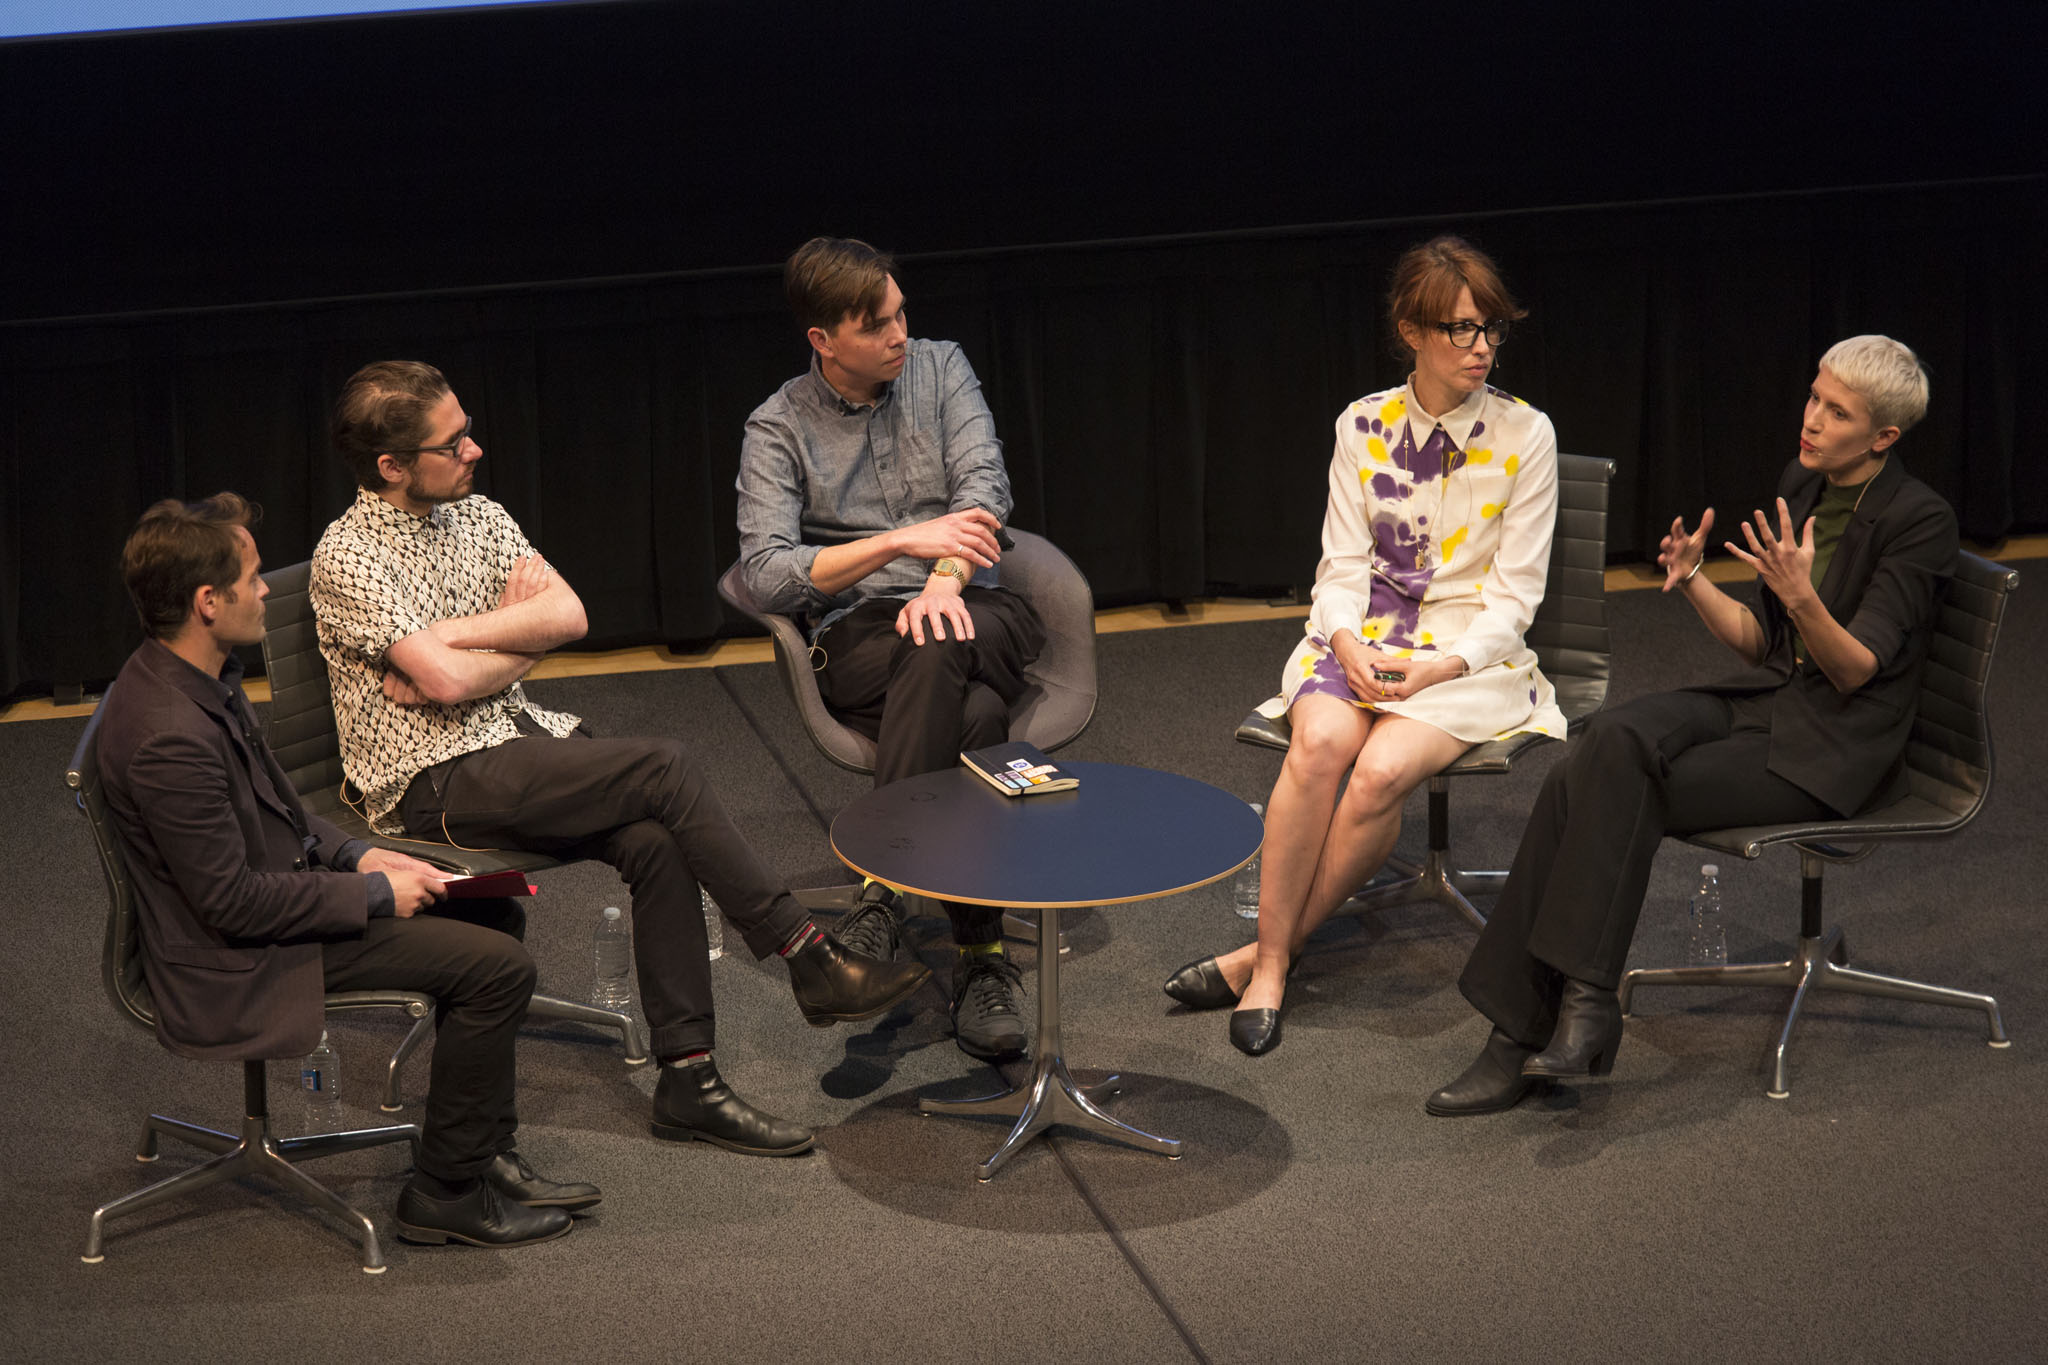 Fionn Meade, Dan Fox, James Bridle, Marisa Mazria-Katz, Claire Evans